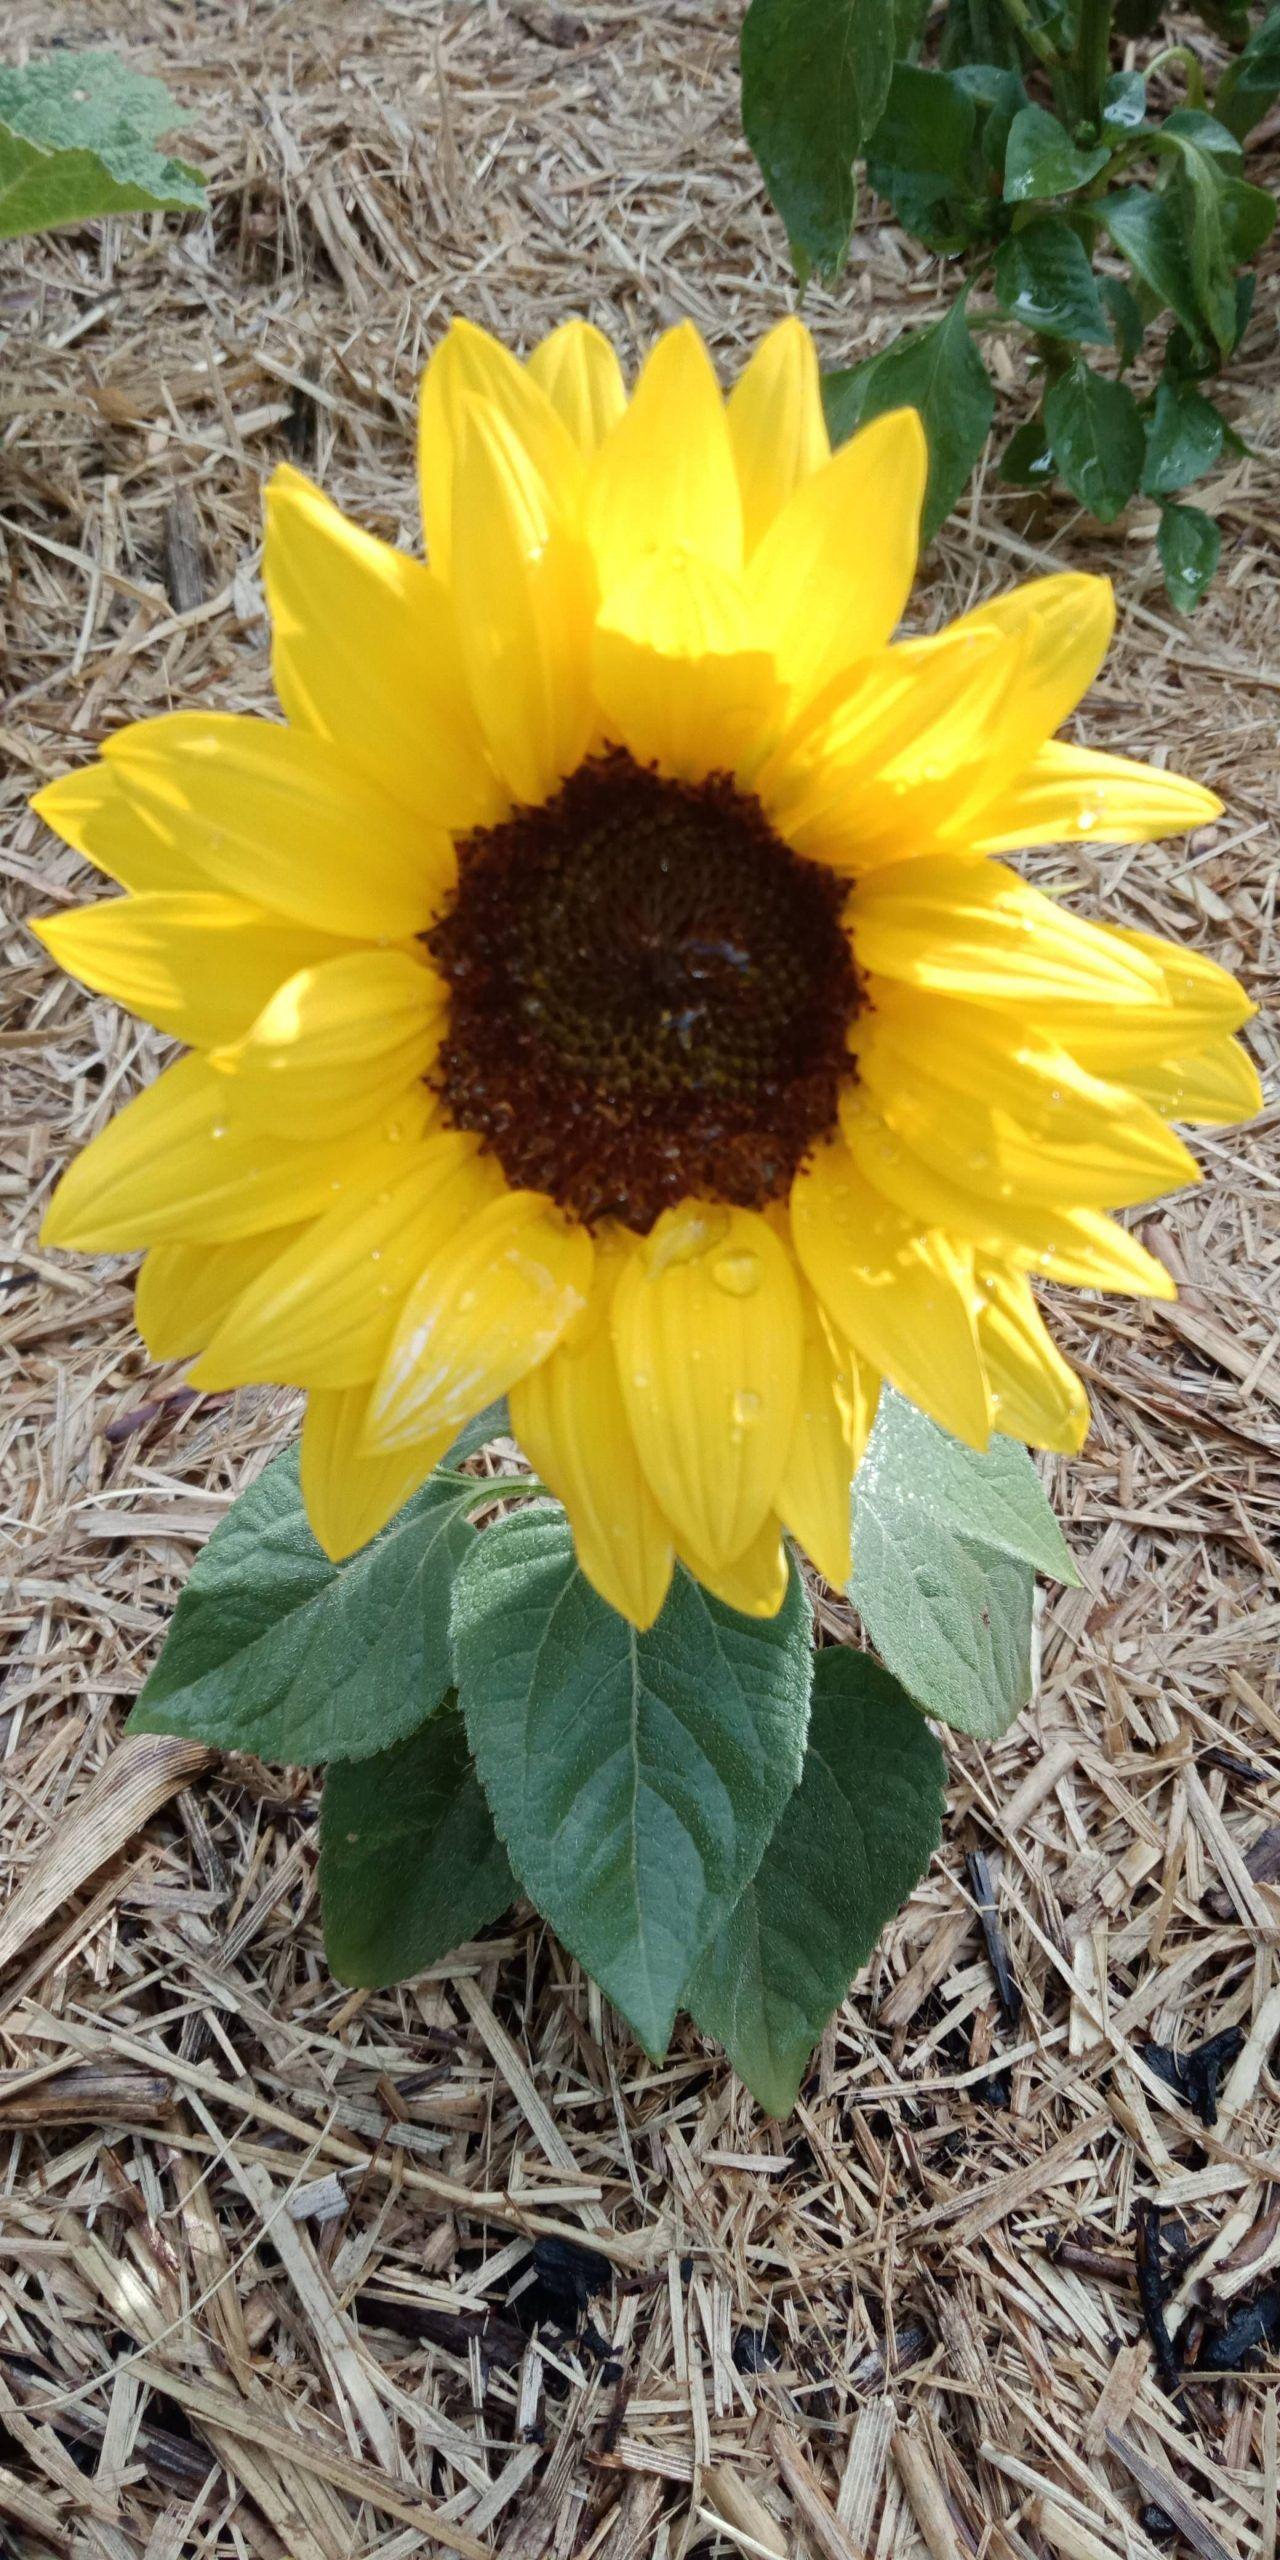 Eagar Little Sunflower Gardening Garden Diy Home Flowers Roses Diy Eagar Flowers Garden Gardening Home R In 2020 Sunflower Garden Easy Garden Home Flowers